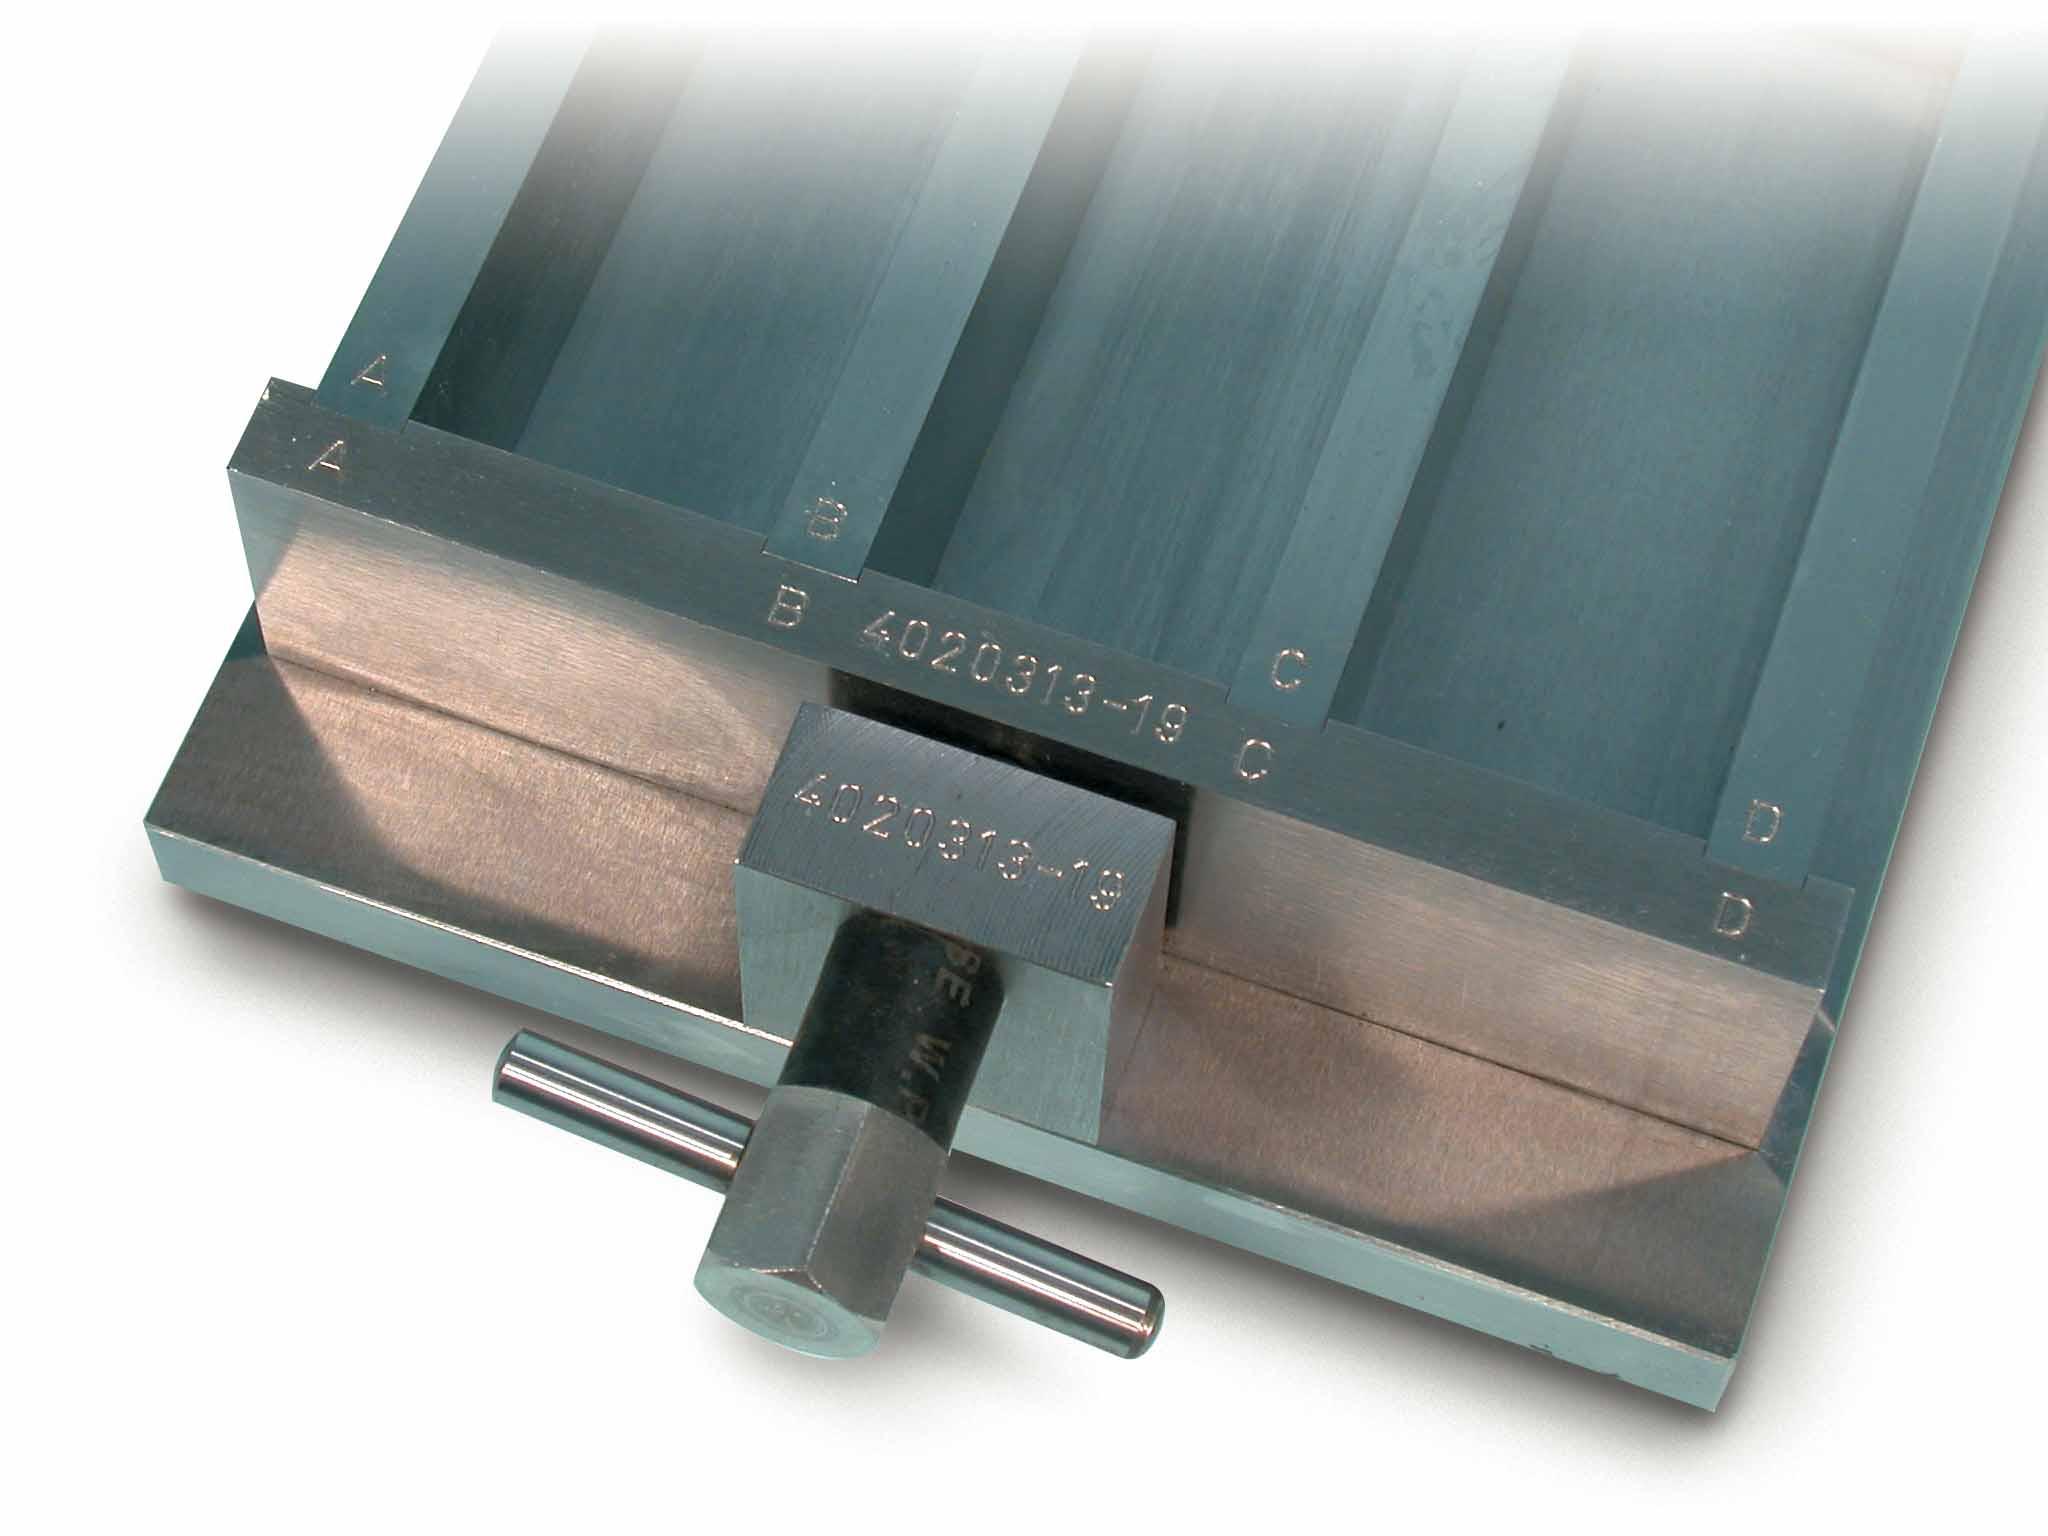 e103-khuon-duc-mau-vua-xi-mang-40-1x40x160mm-en-matest-e103-www-thieny-vn